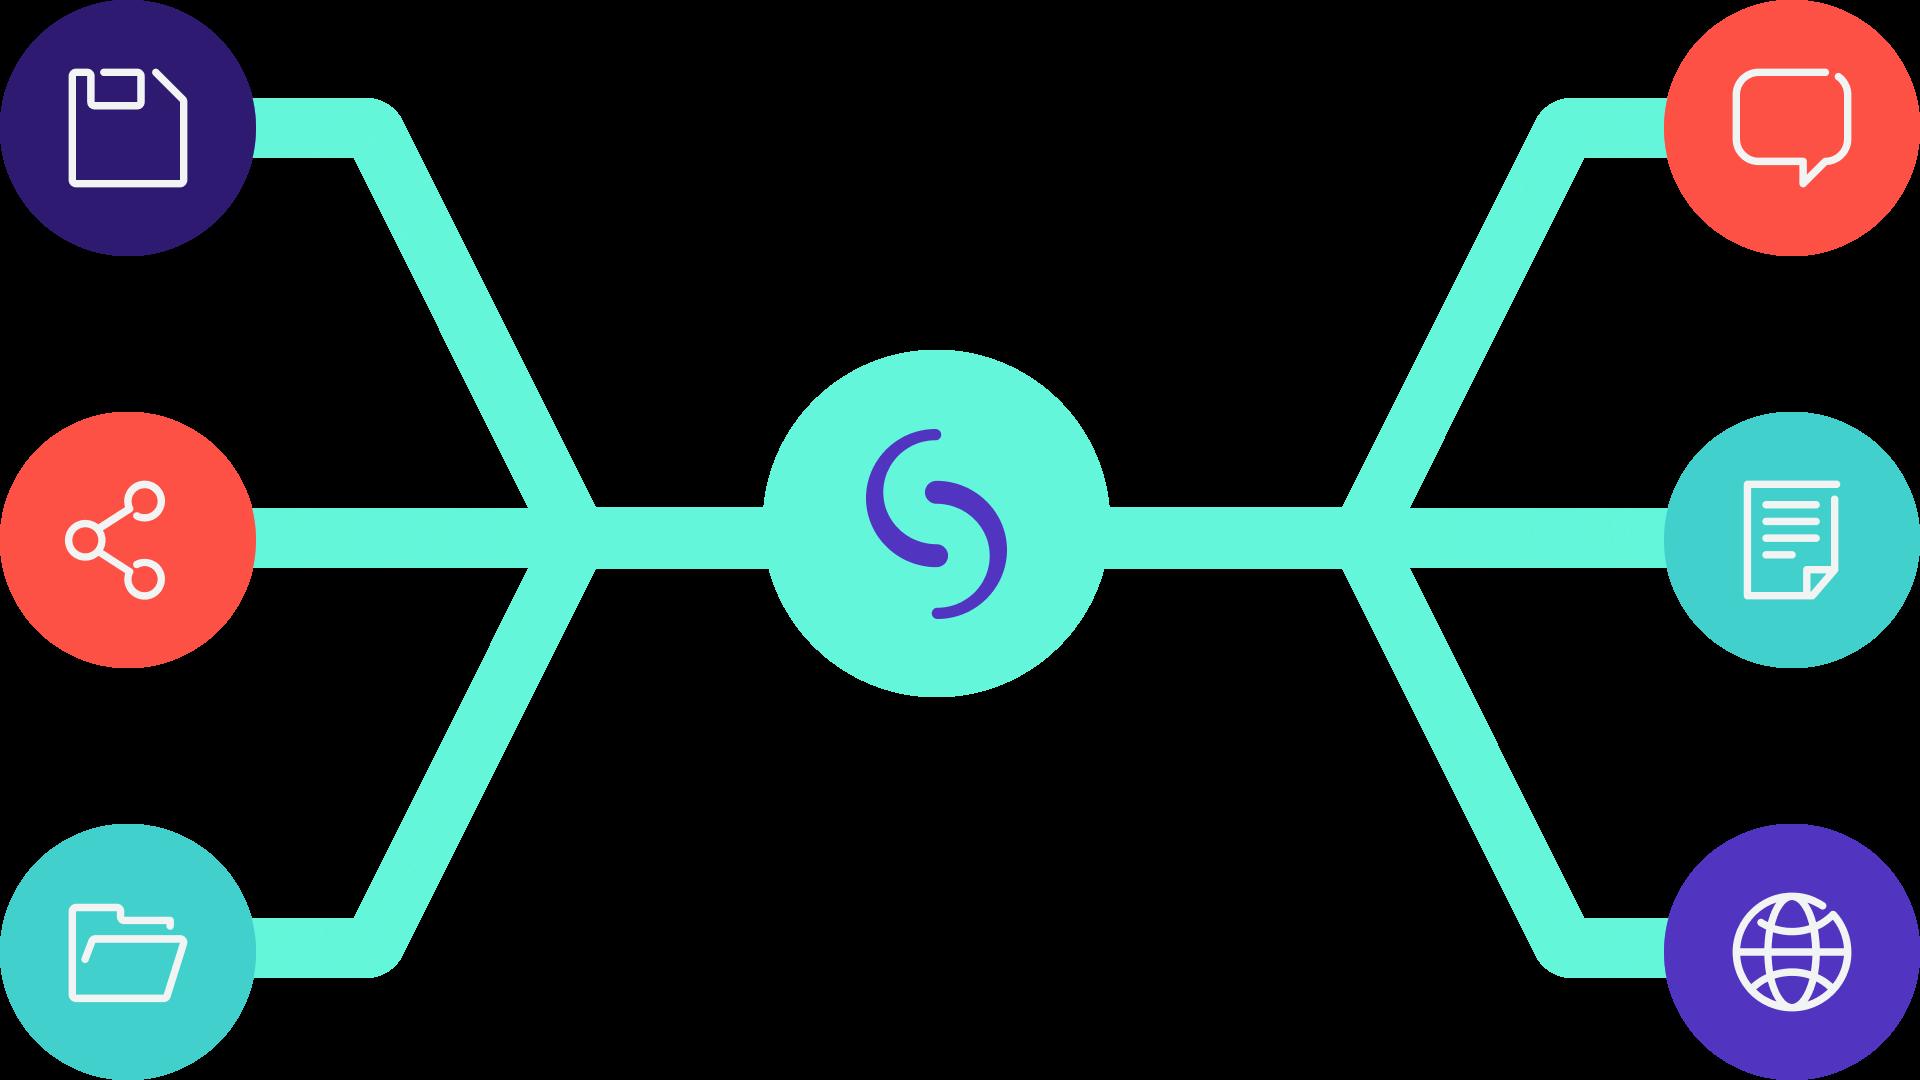 starmind_integrations_211007